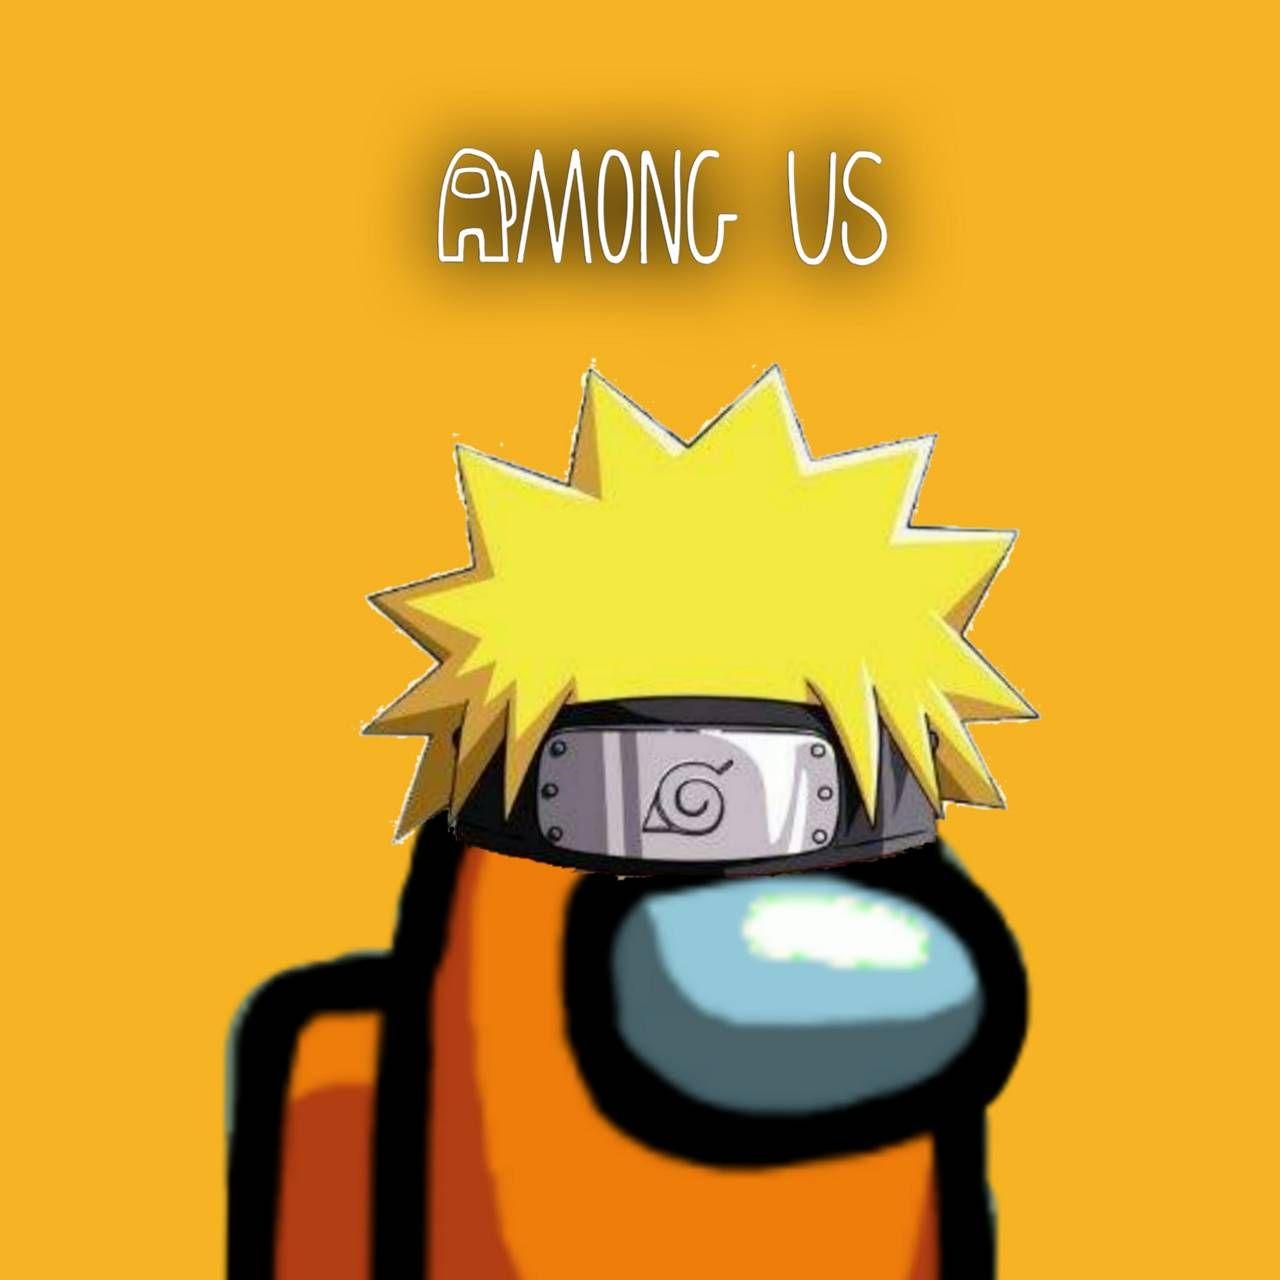 Naruto Among Us Wallpapers - Wallpaper Cave